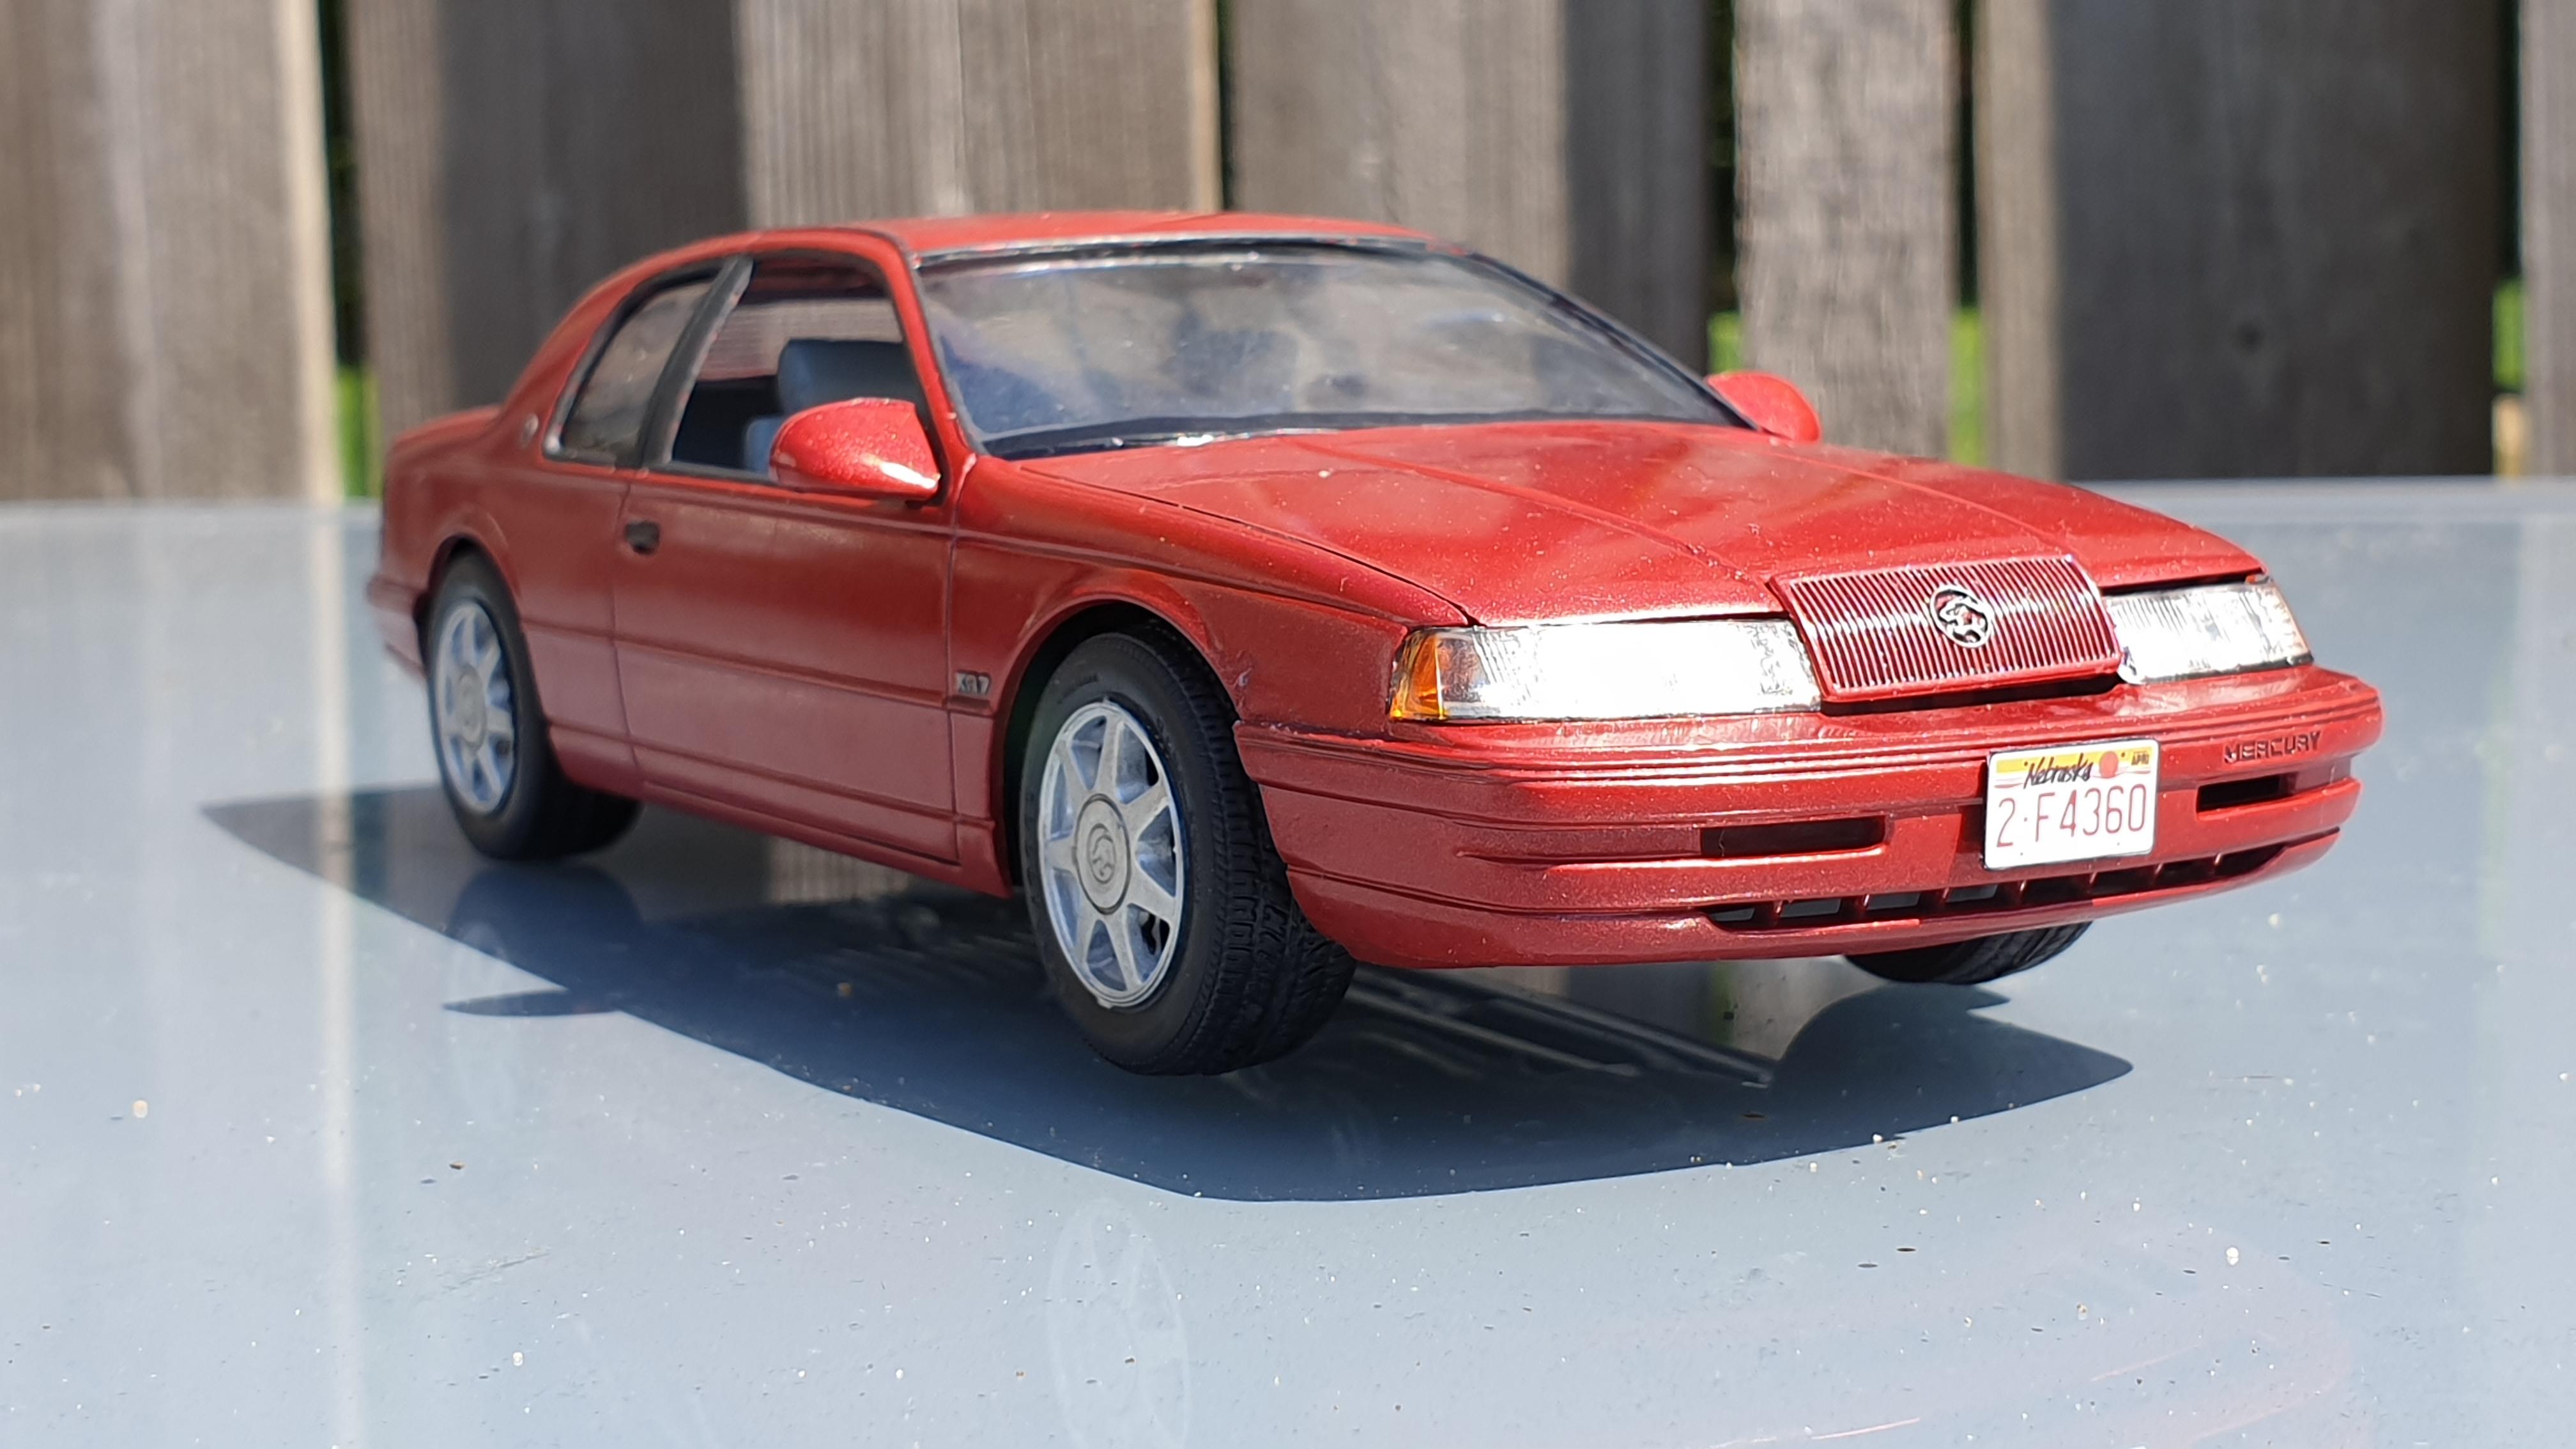 1990cougarxr7_red-2.jpg